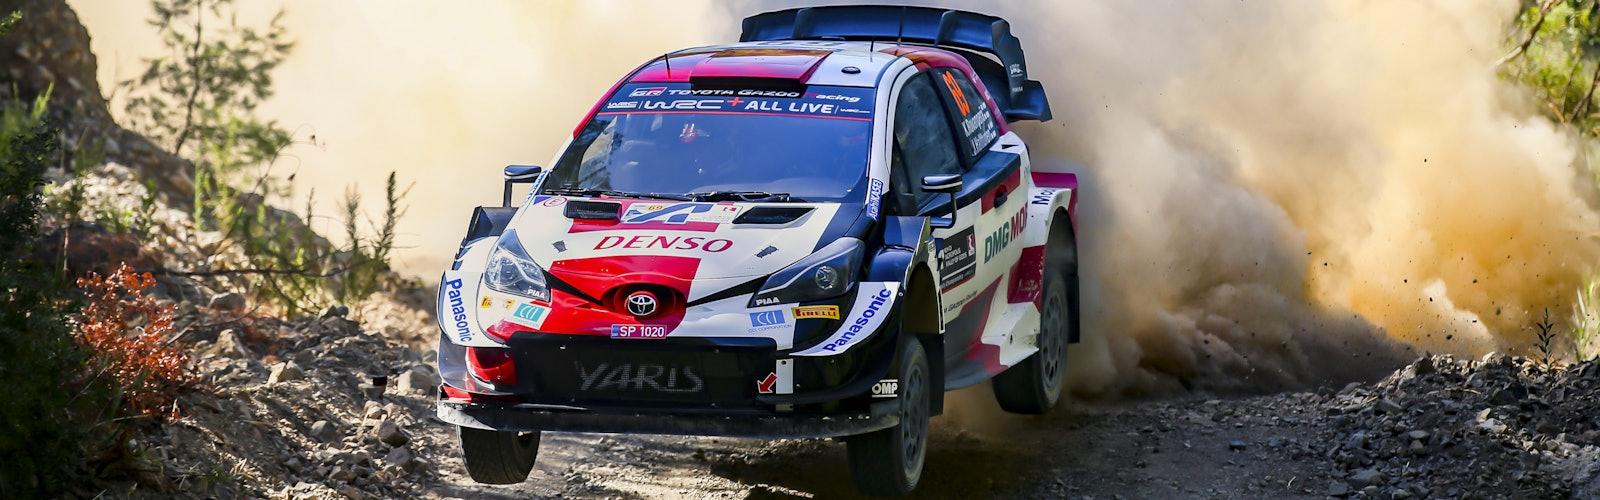 WRC_2021_Rd.9_162